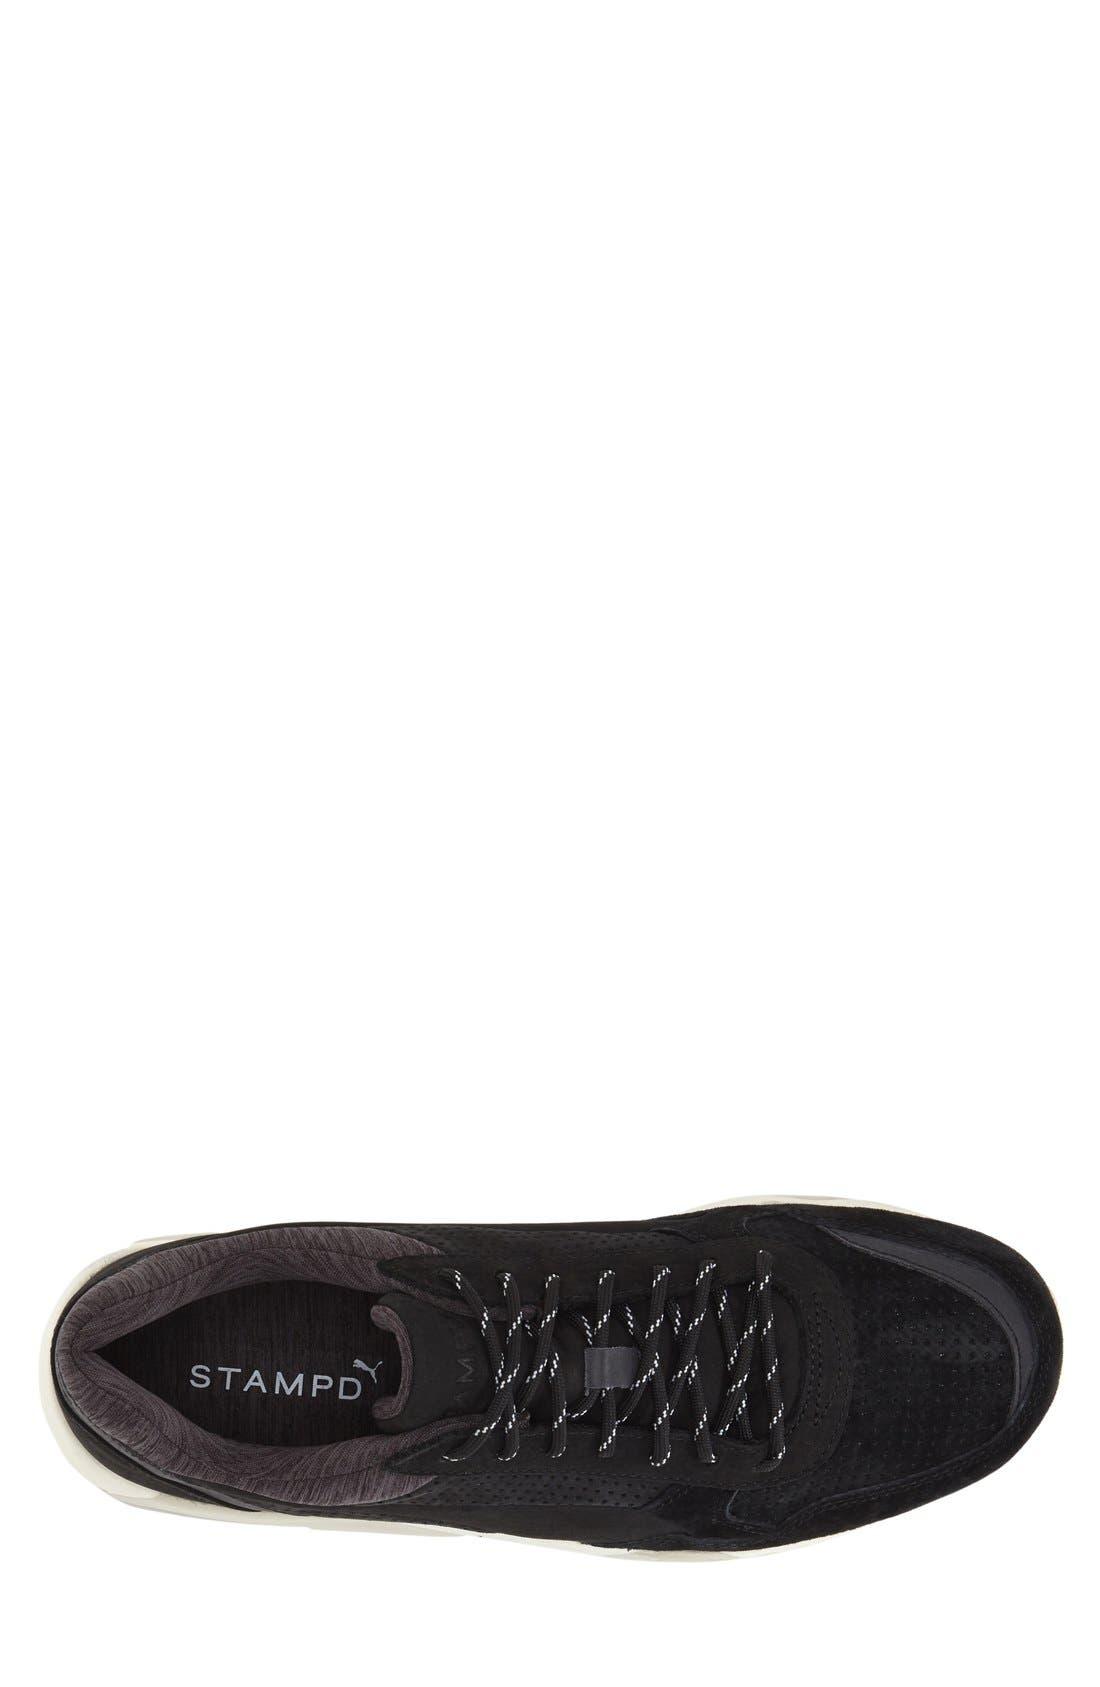 'R698 X STAMPD' Sneaker,                             Alternate thumbnail 3, color,                             Black